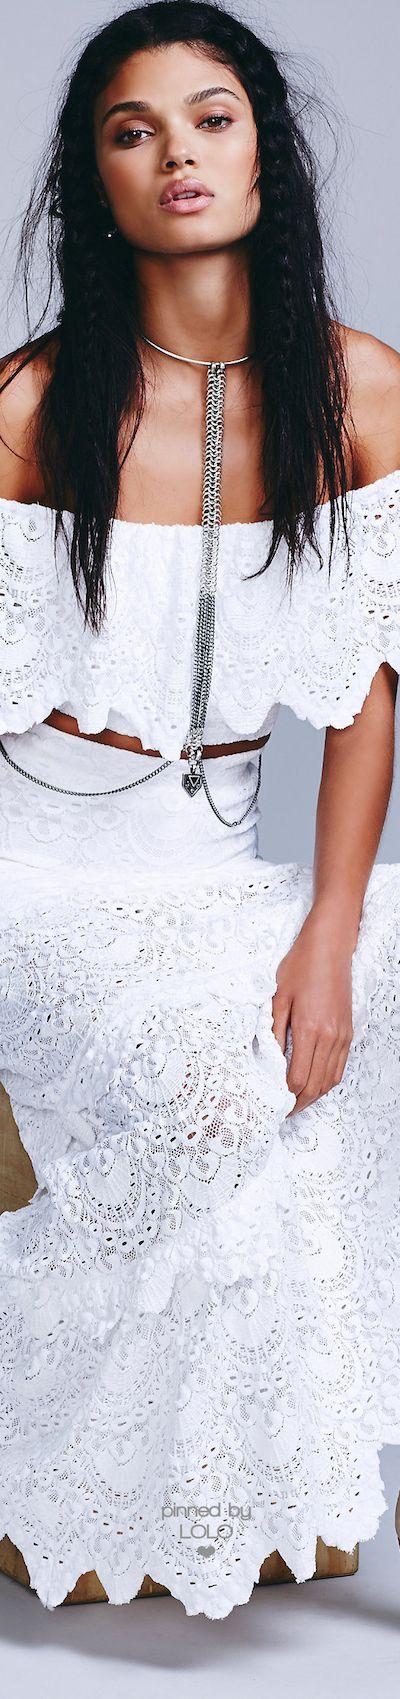 Free People ≫∙∙☮ Bohème Babe ☮∙∙≪• ❤️ Babz™ ✿ιиѕριяαтισи❀ #abbigliamento #bohojewelry #boho